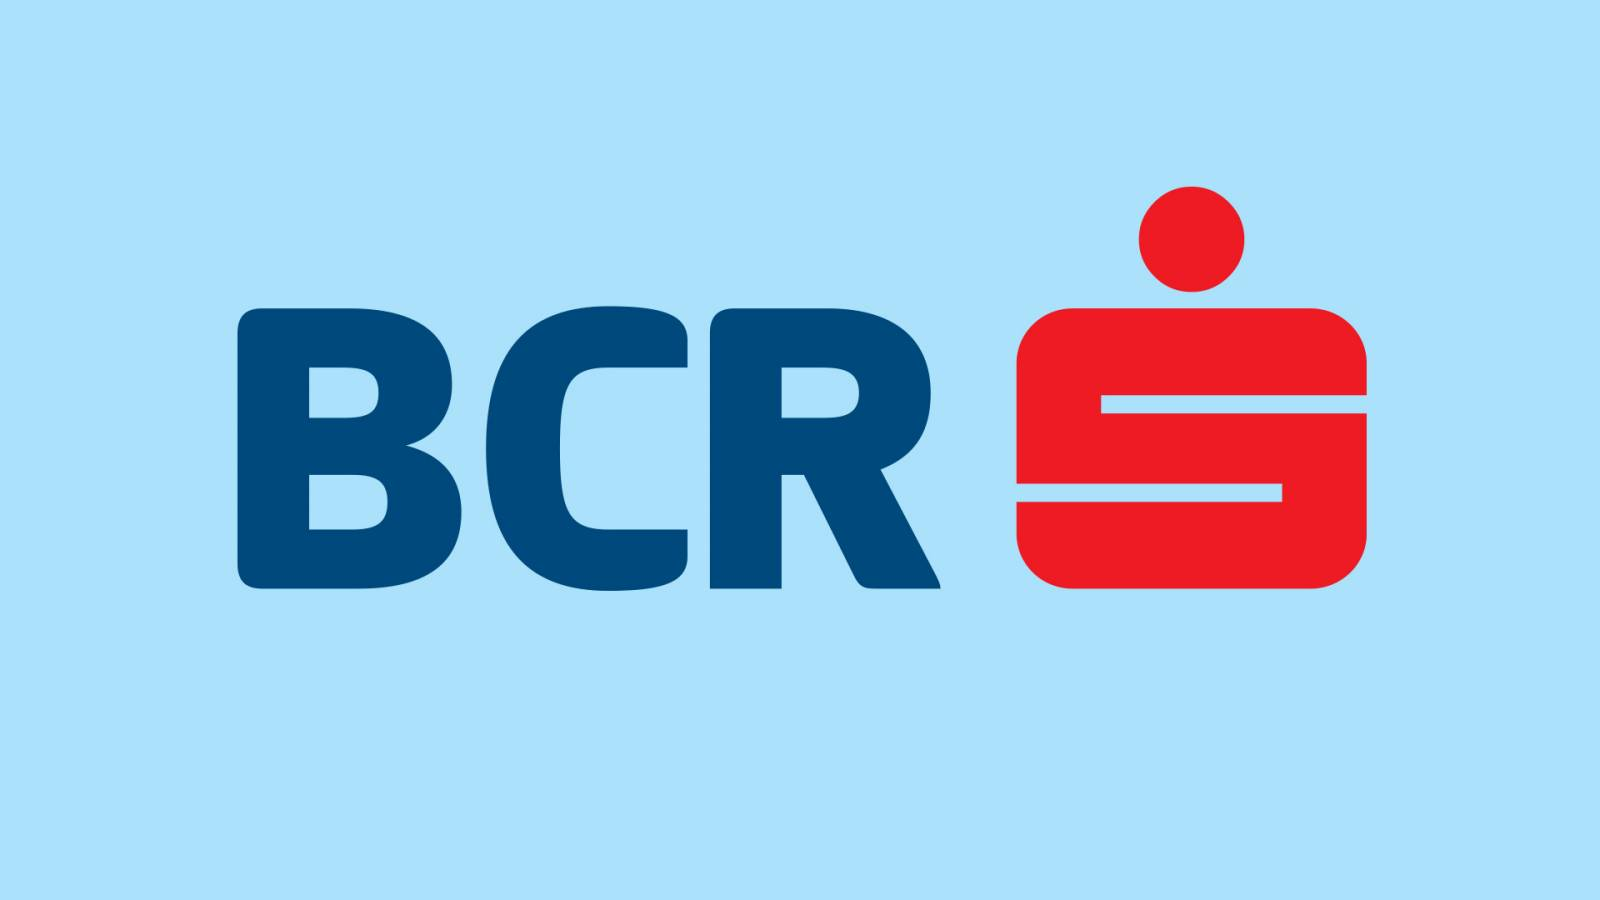 BCR Romania statii